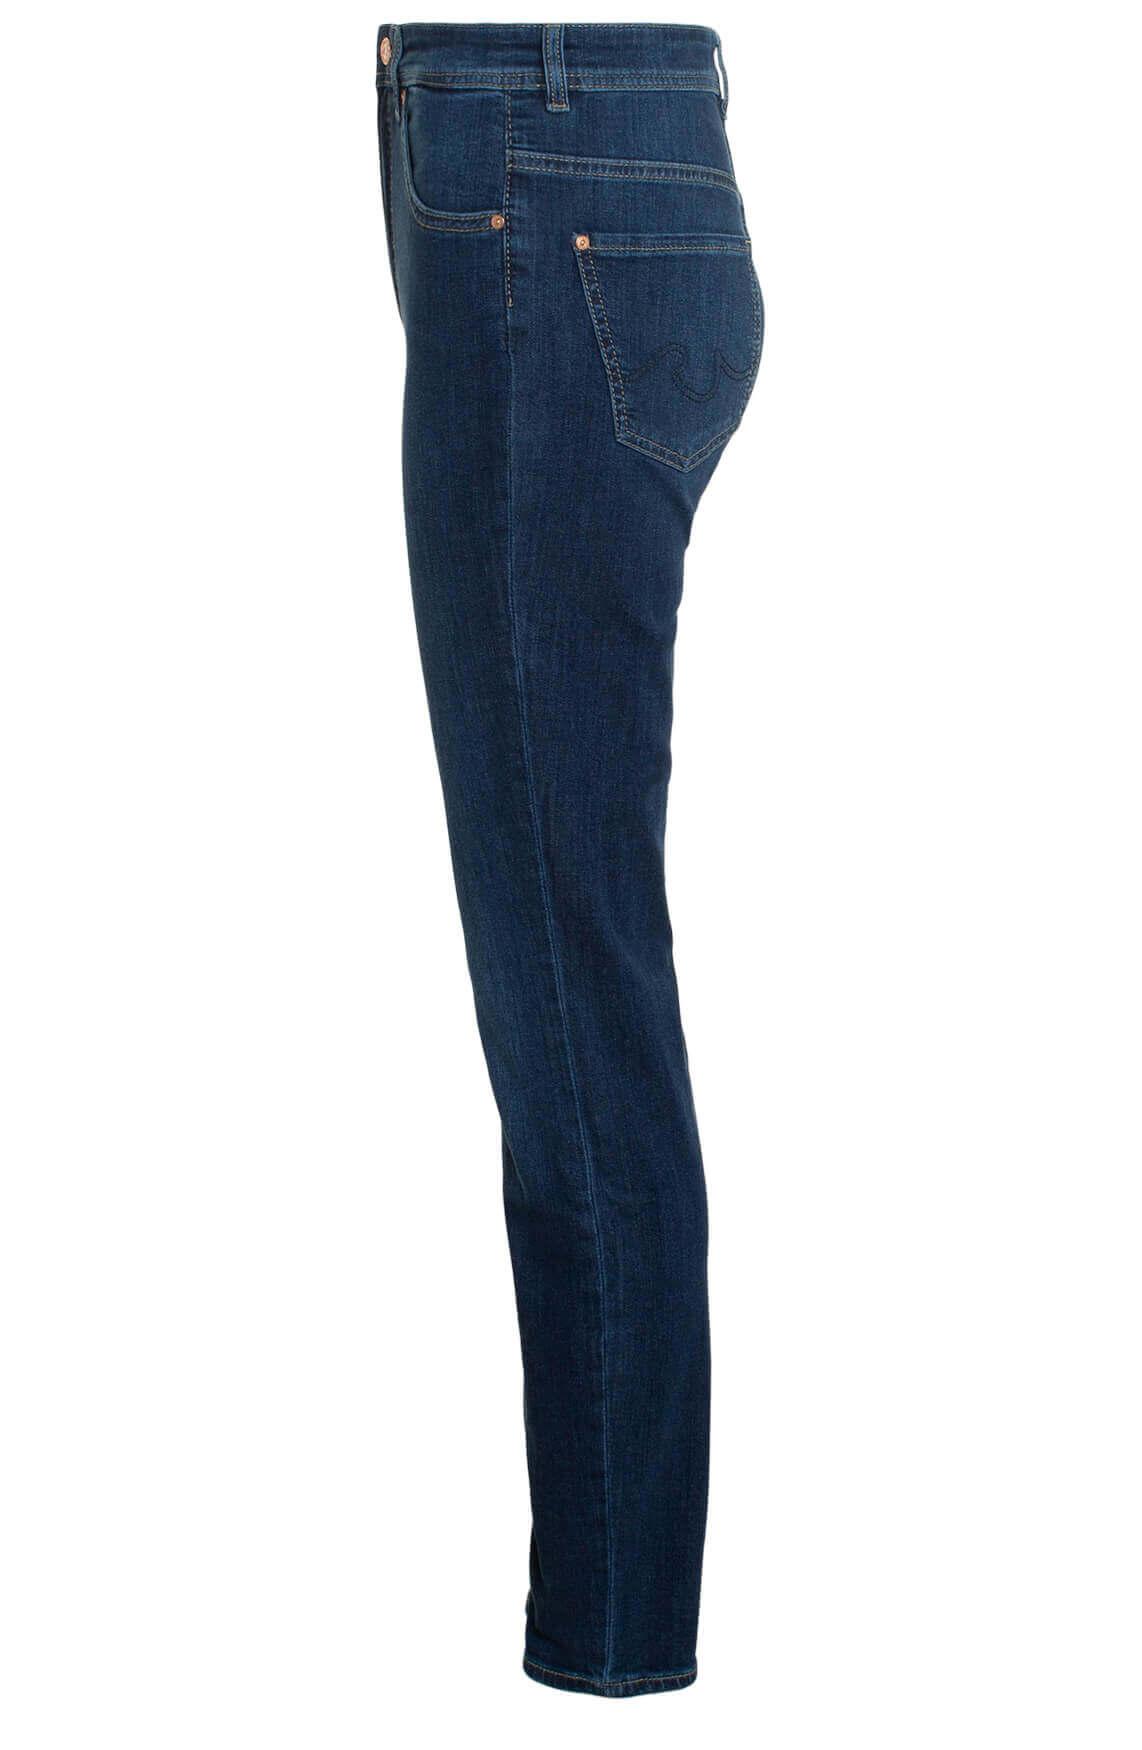 Rosner Dames Audrey high waist jeans Blauw